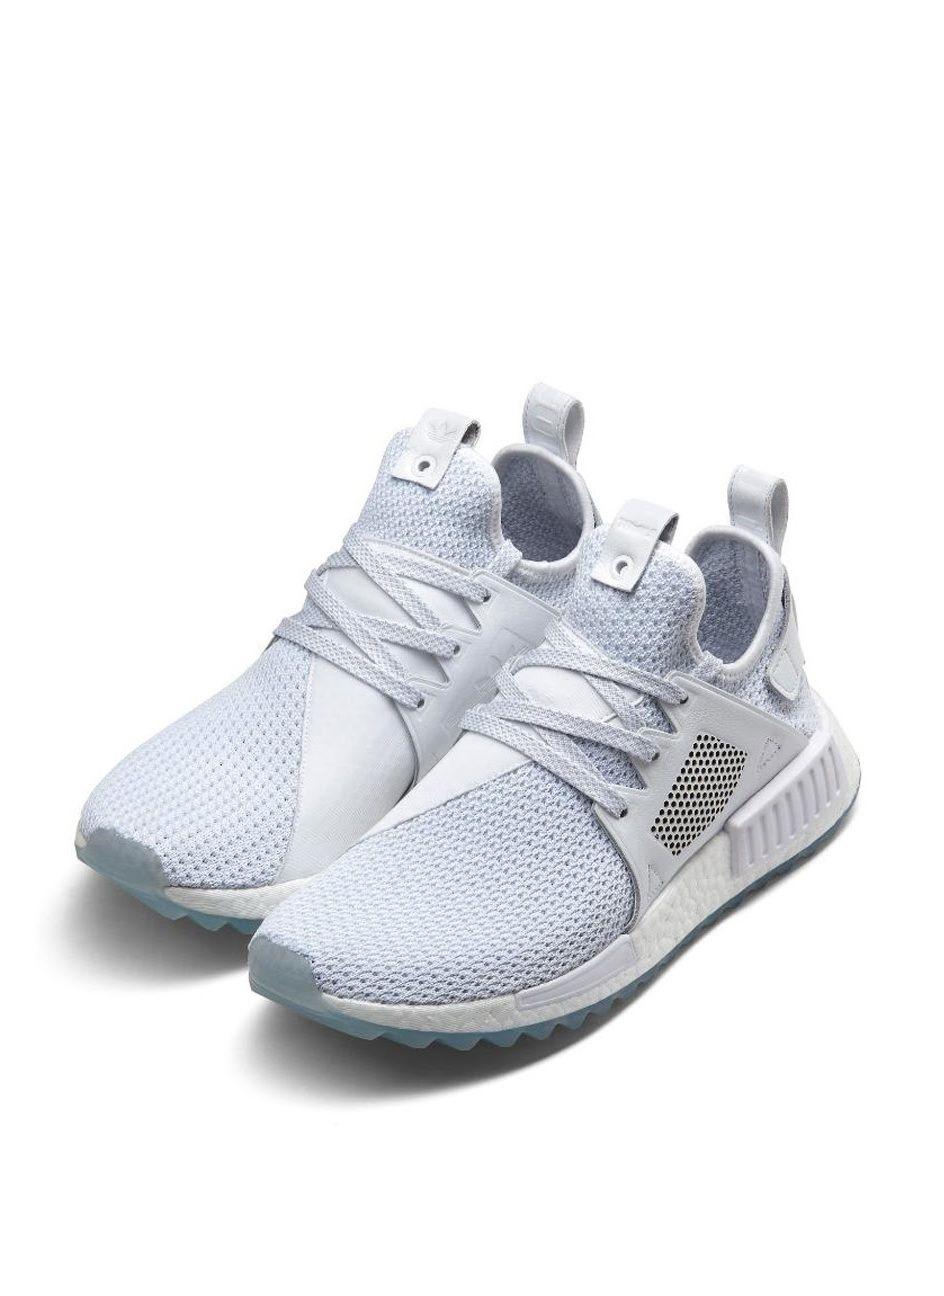 more photos 95953 fe655 Titolo x adidas Consortium NMD XR1 | •Kicks • | Sneakers ...